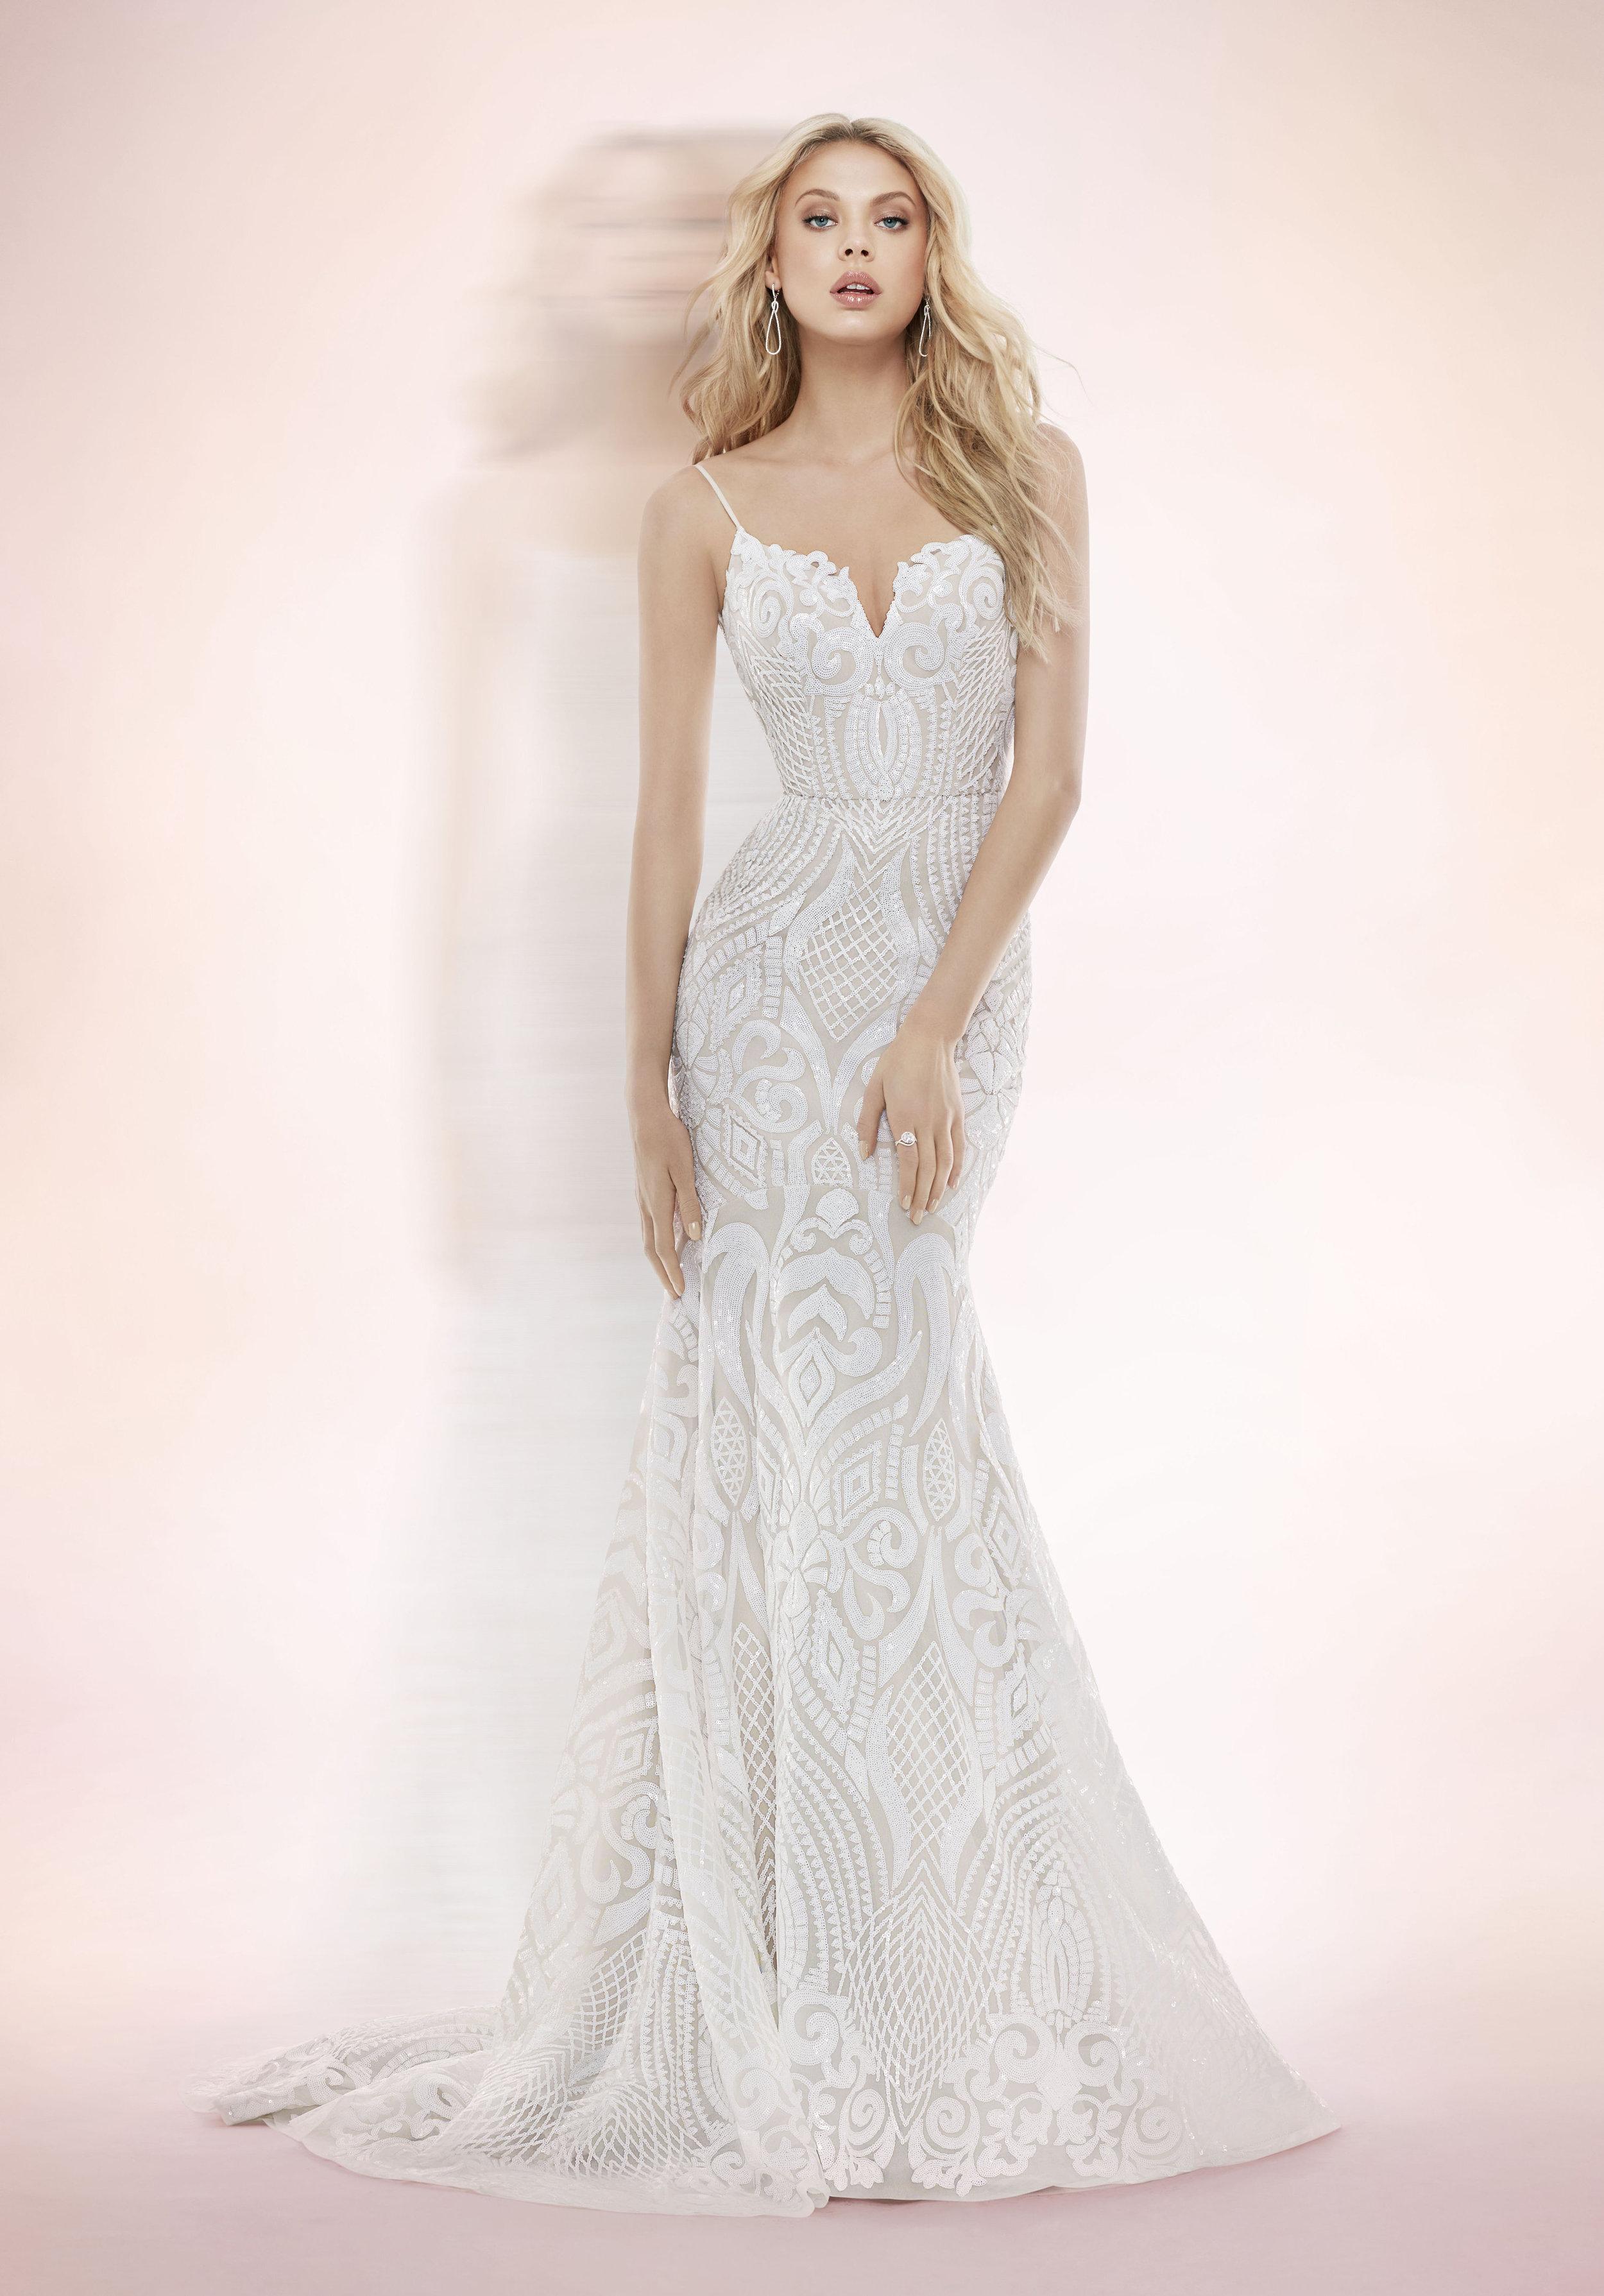 blush-hayley-paige-bridal-spring-2017-style-1710-west_2.jpg